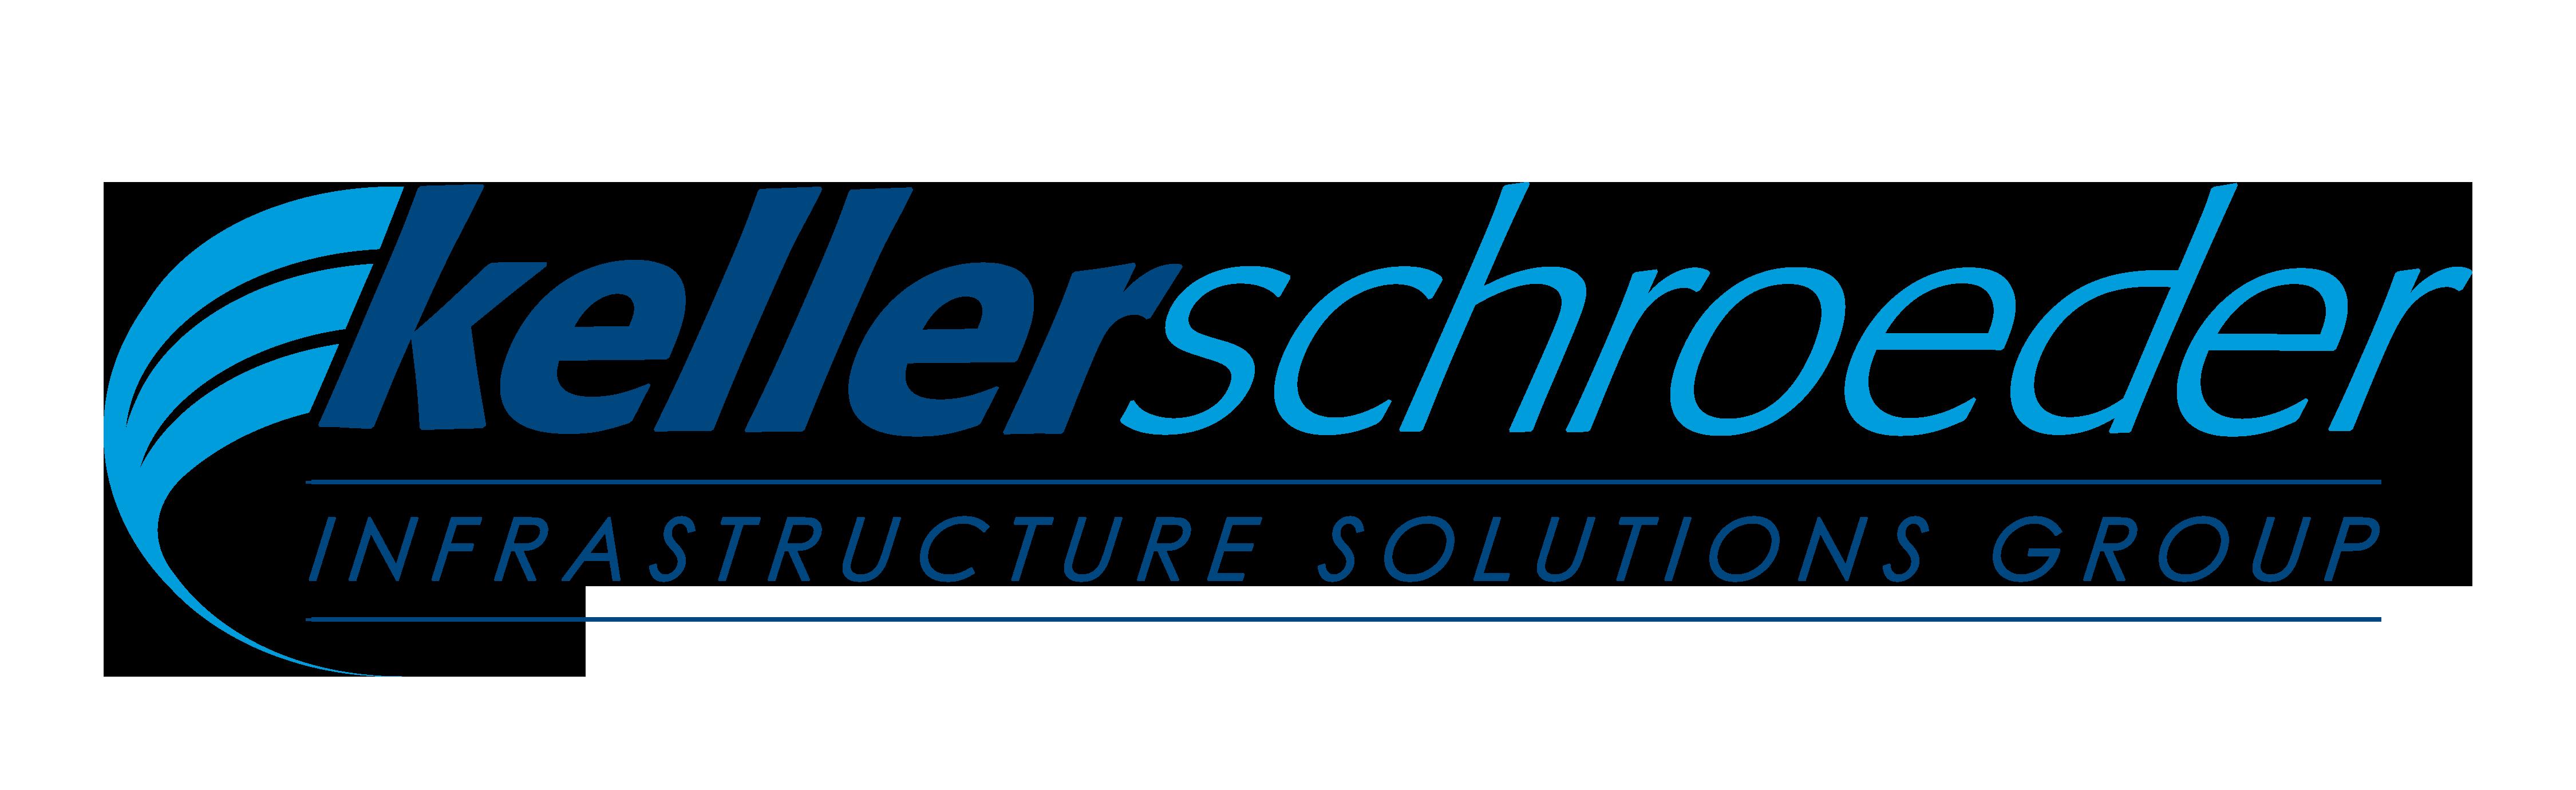 KS Group Logo - Infrastructure Solutions 2-Color Transparent